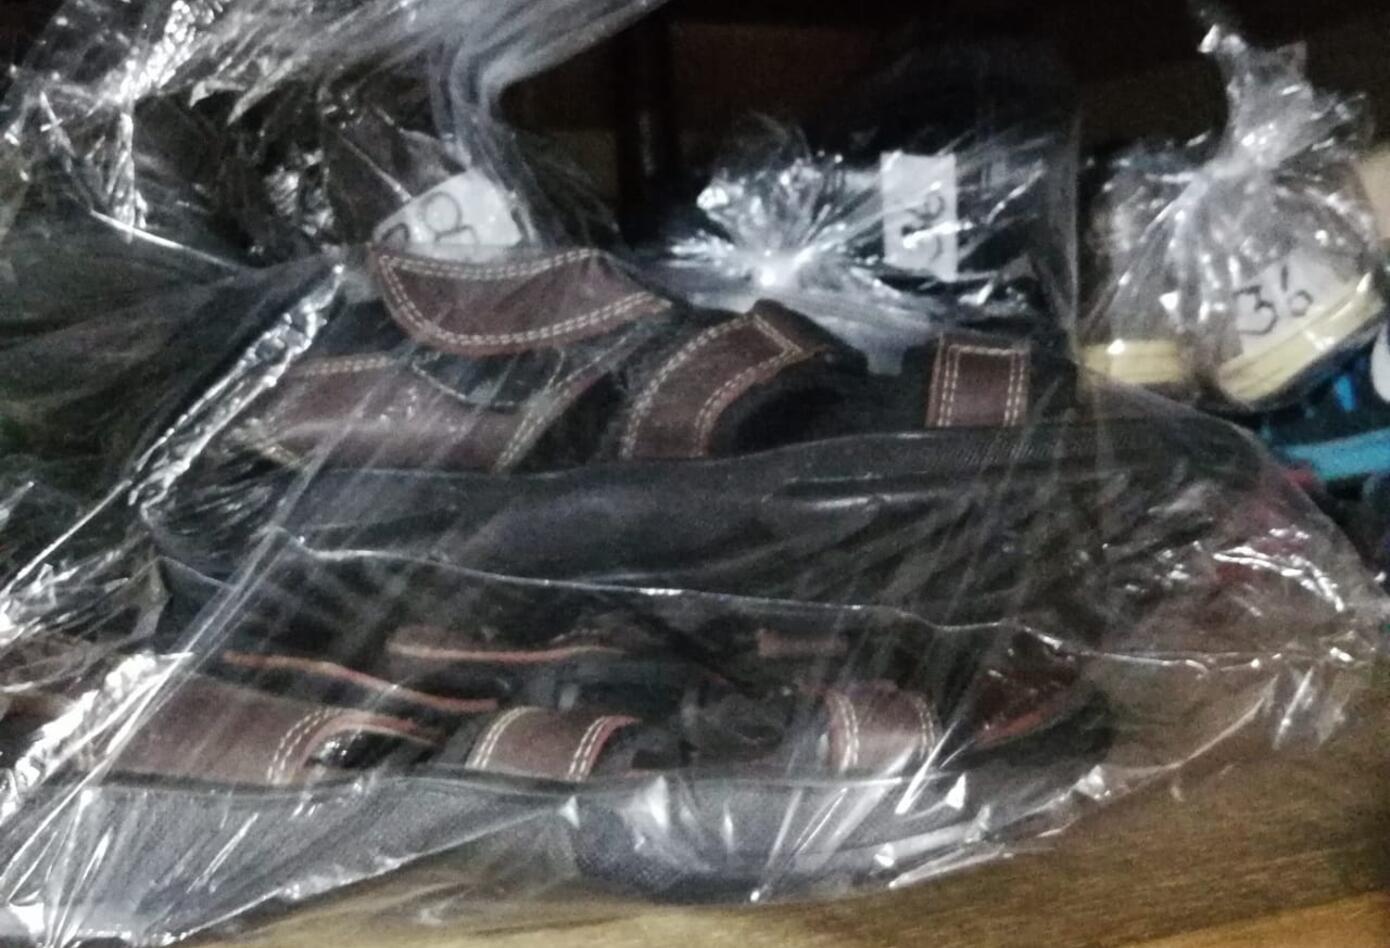 Sandalias donadas por la ciudadanía